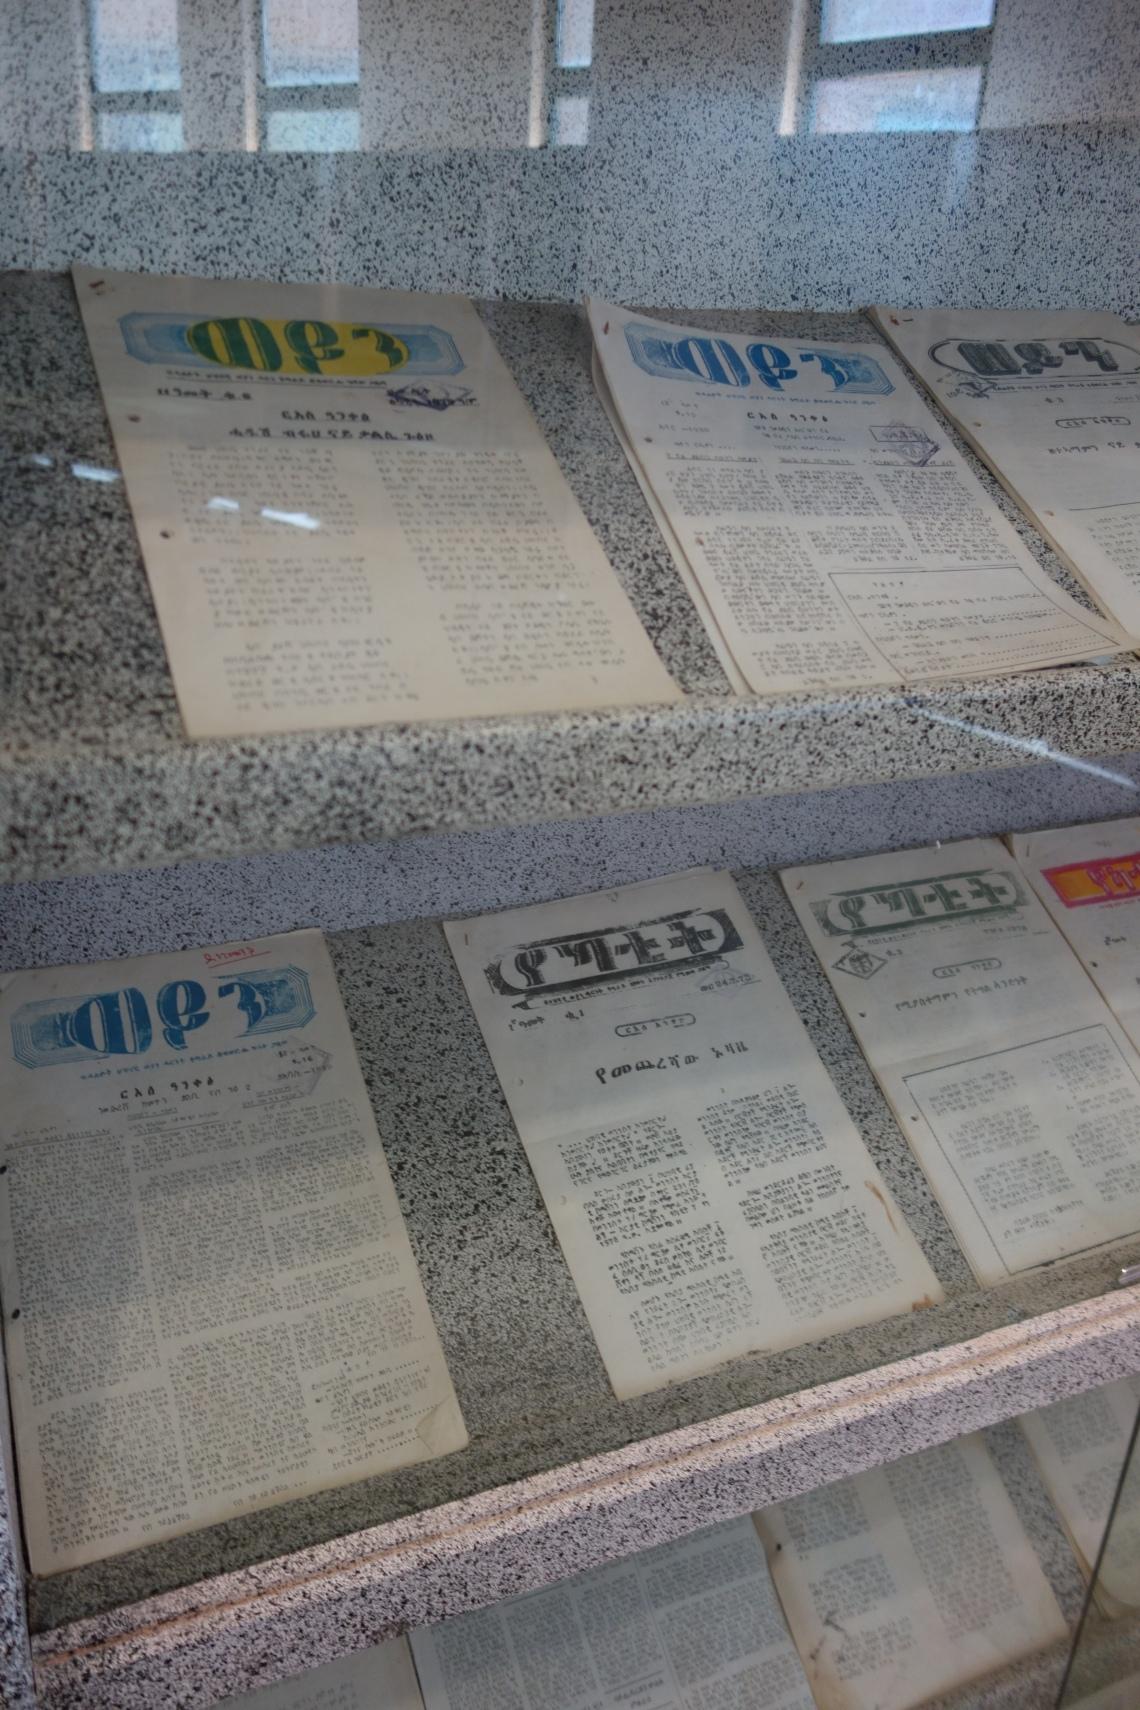 tplf propaganda newsletter mekele (2)